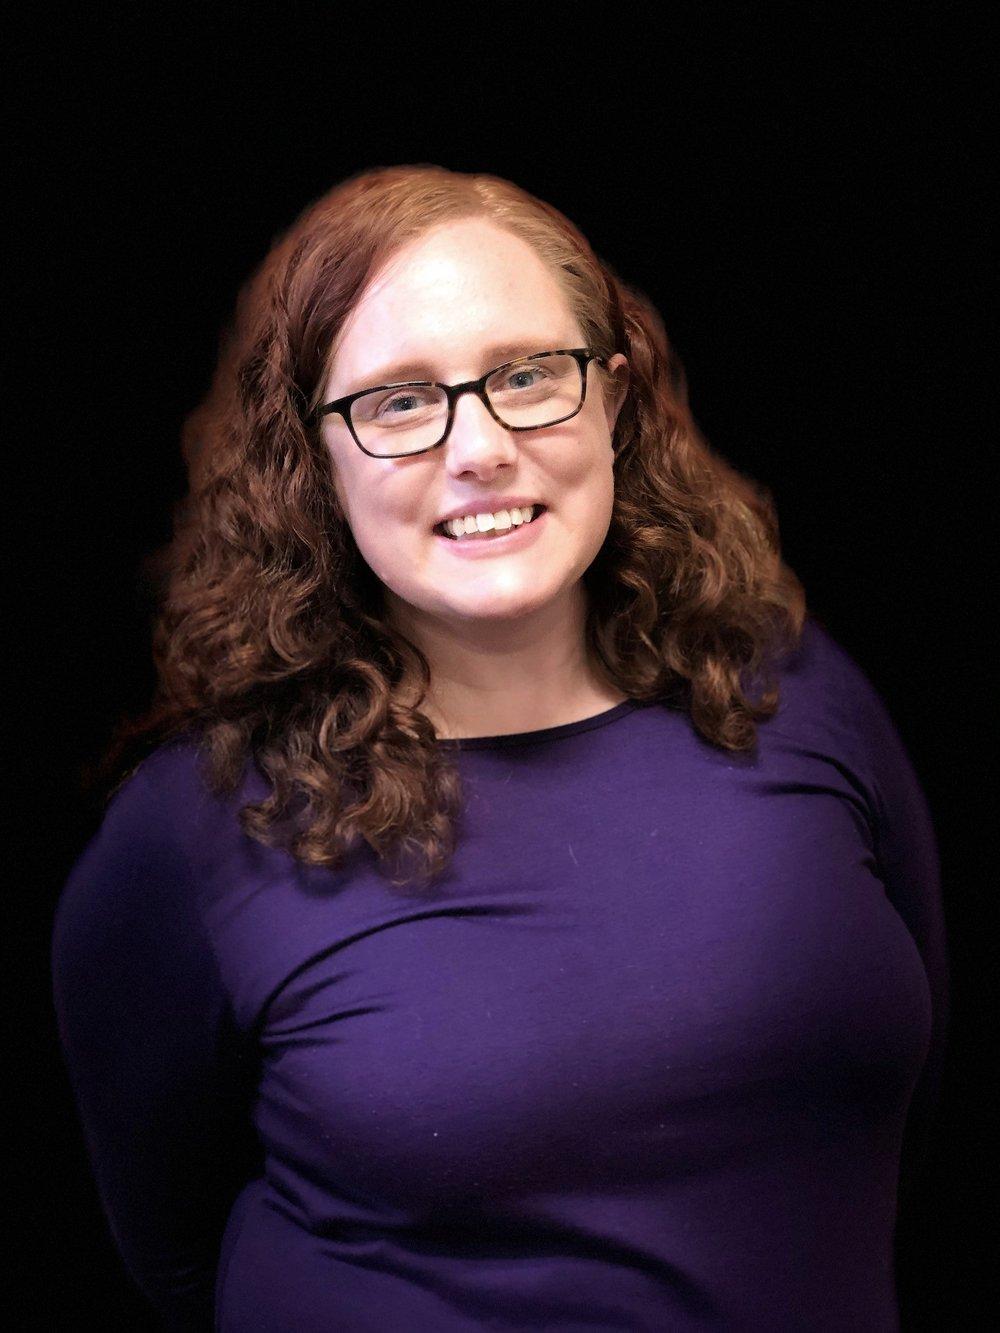 Julie FOX - Executive Directordirector@irwpstl.org